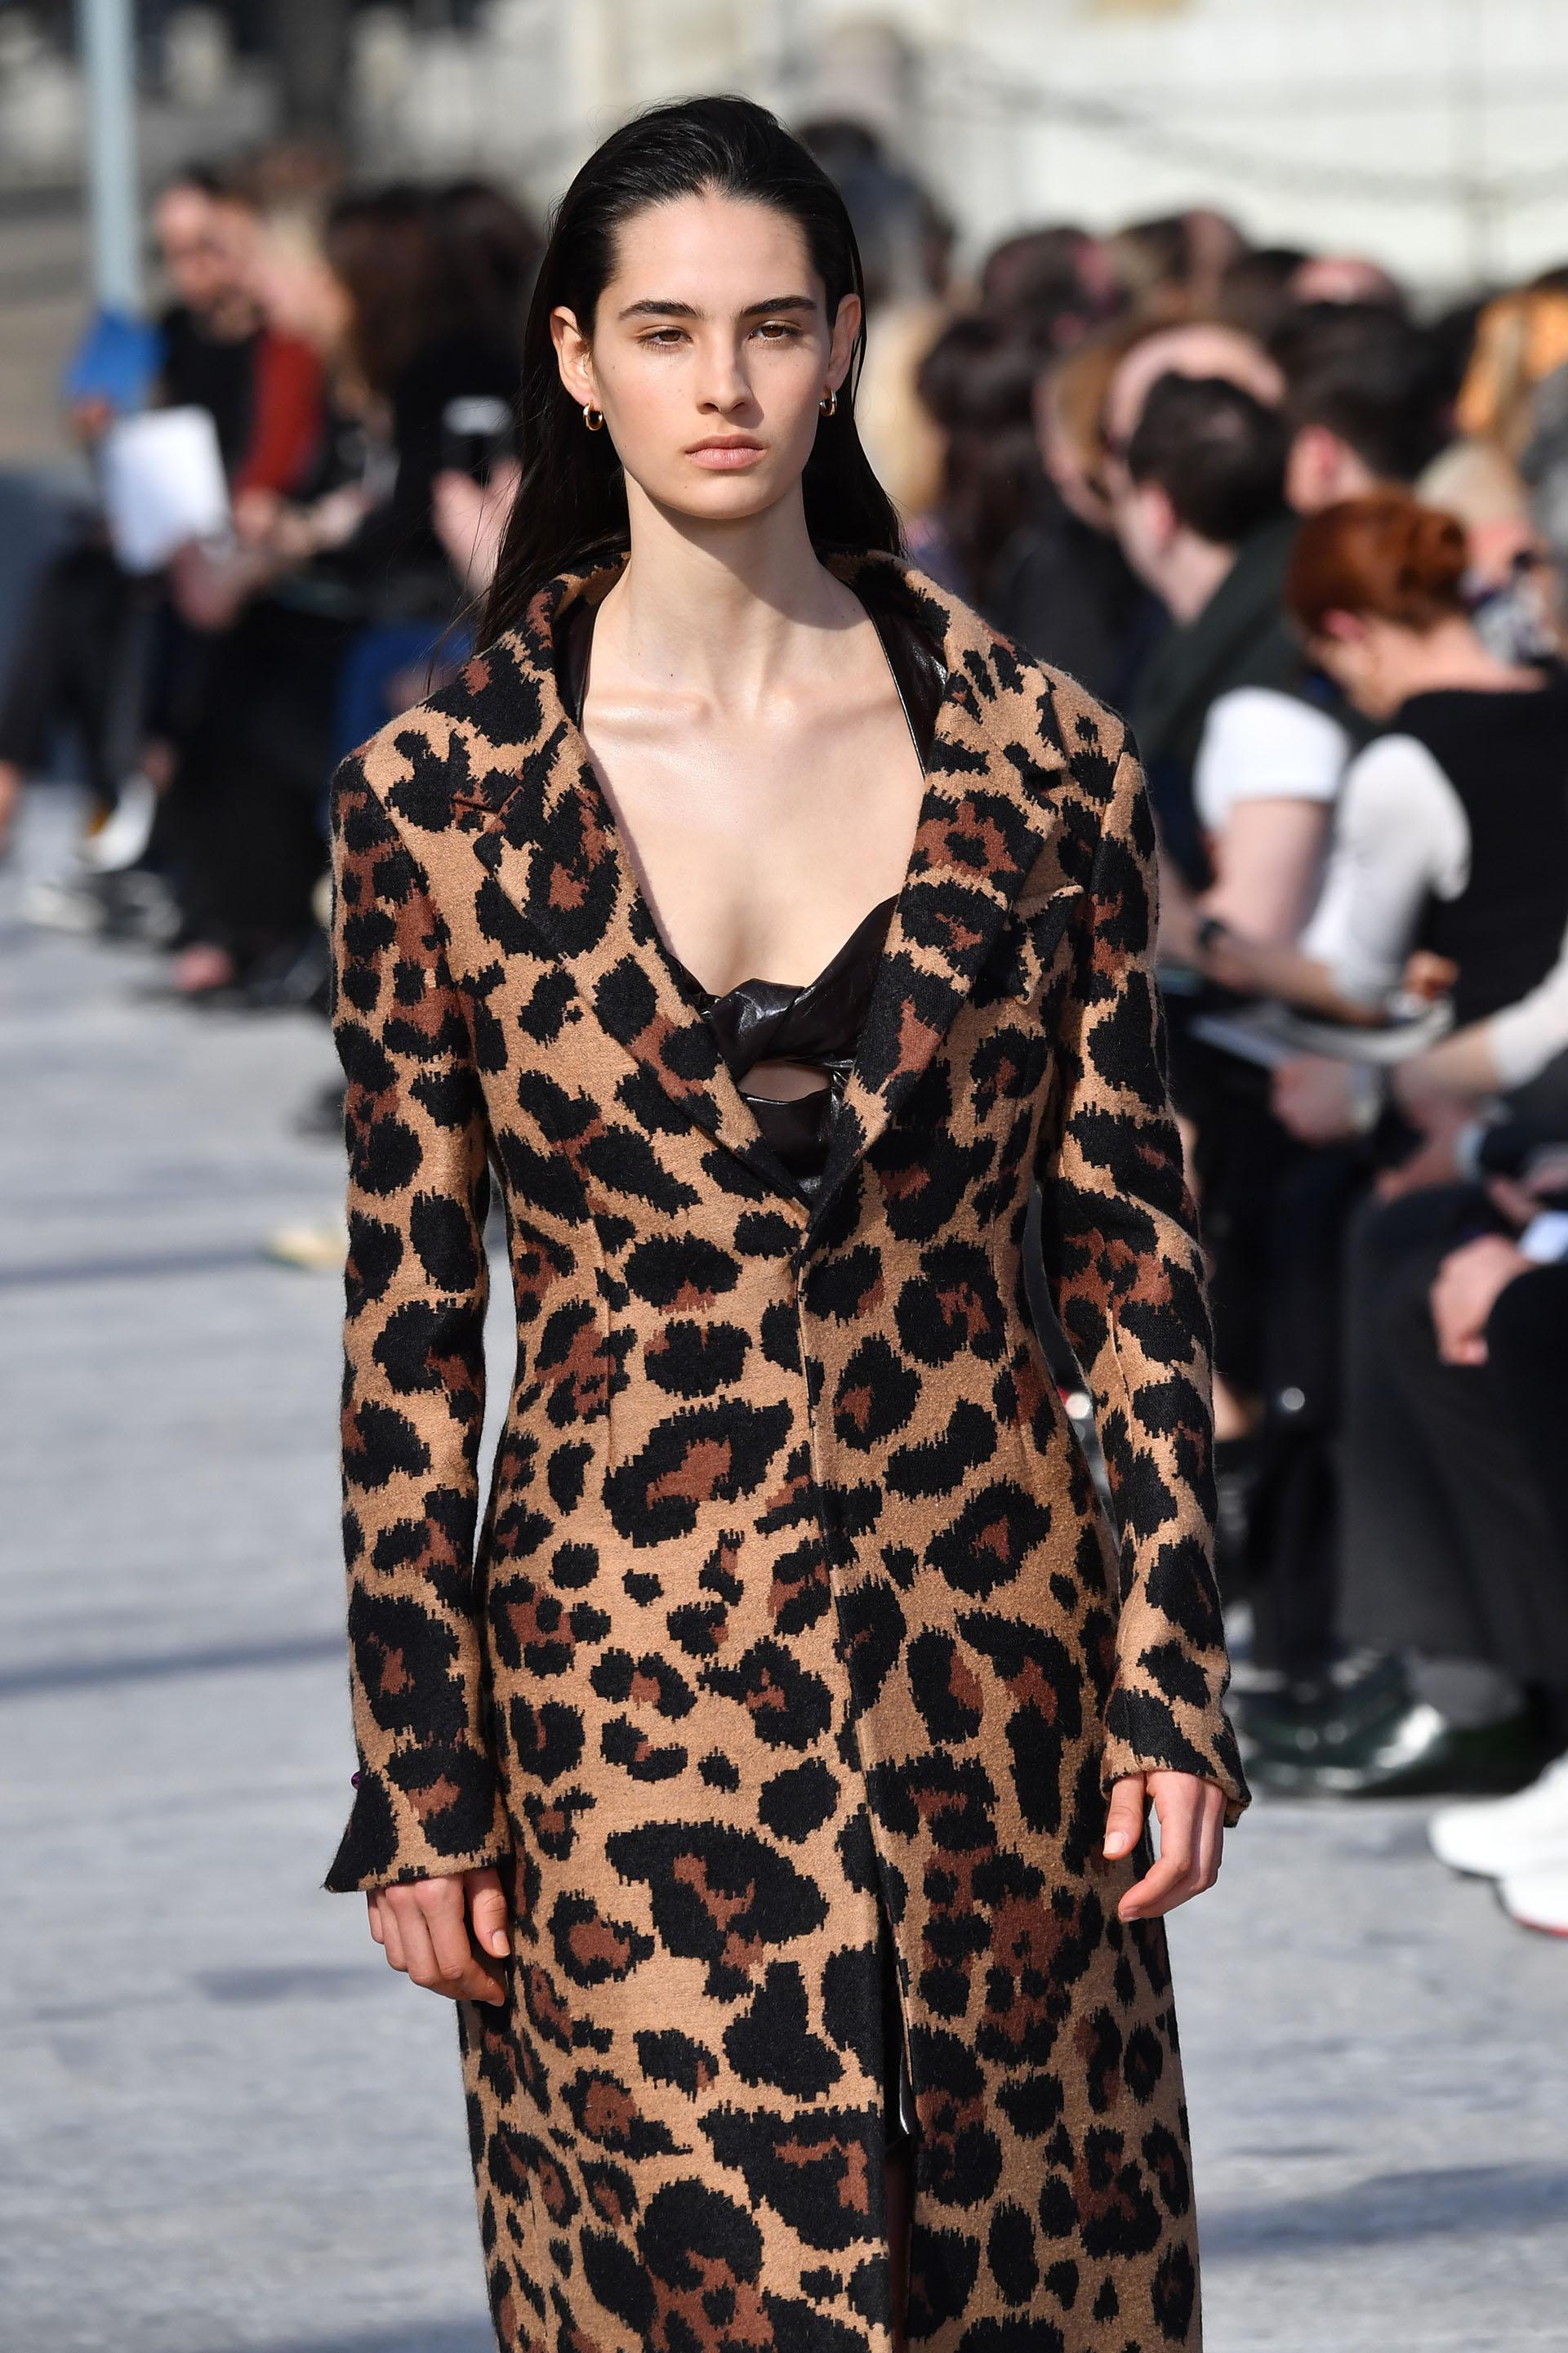 Print leopardo en Milán: Bottega Veneta presentó un maxi tapado de animal print de leopardo (Photo by Andreas SOLARO / AFP)